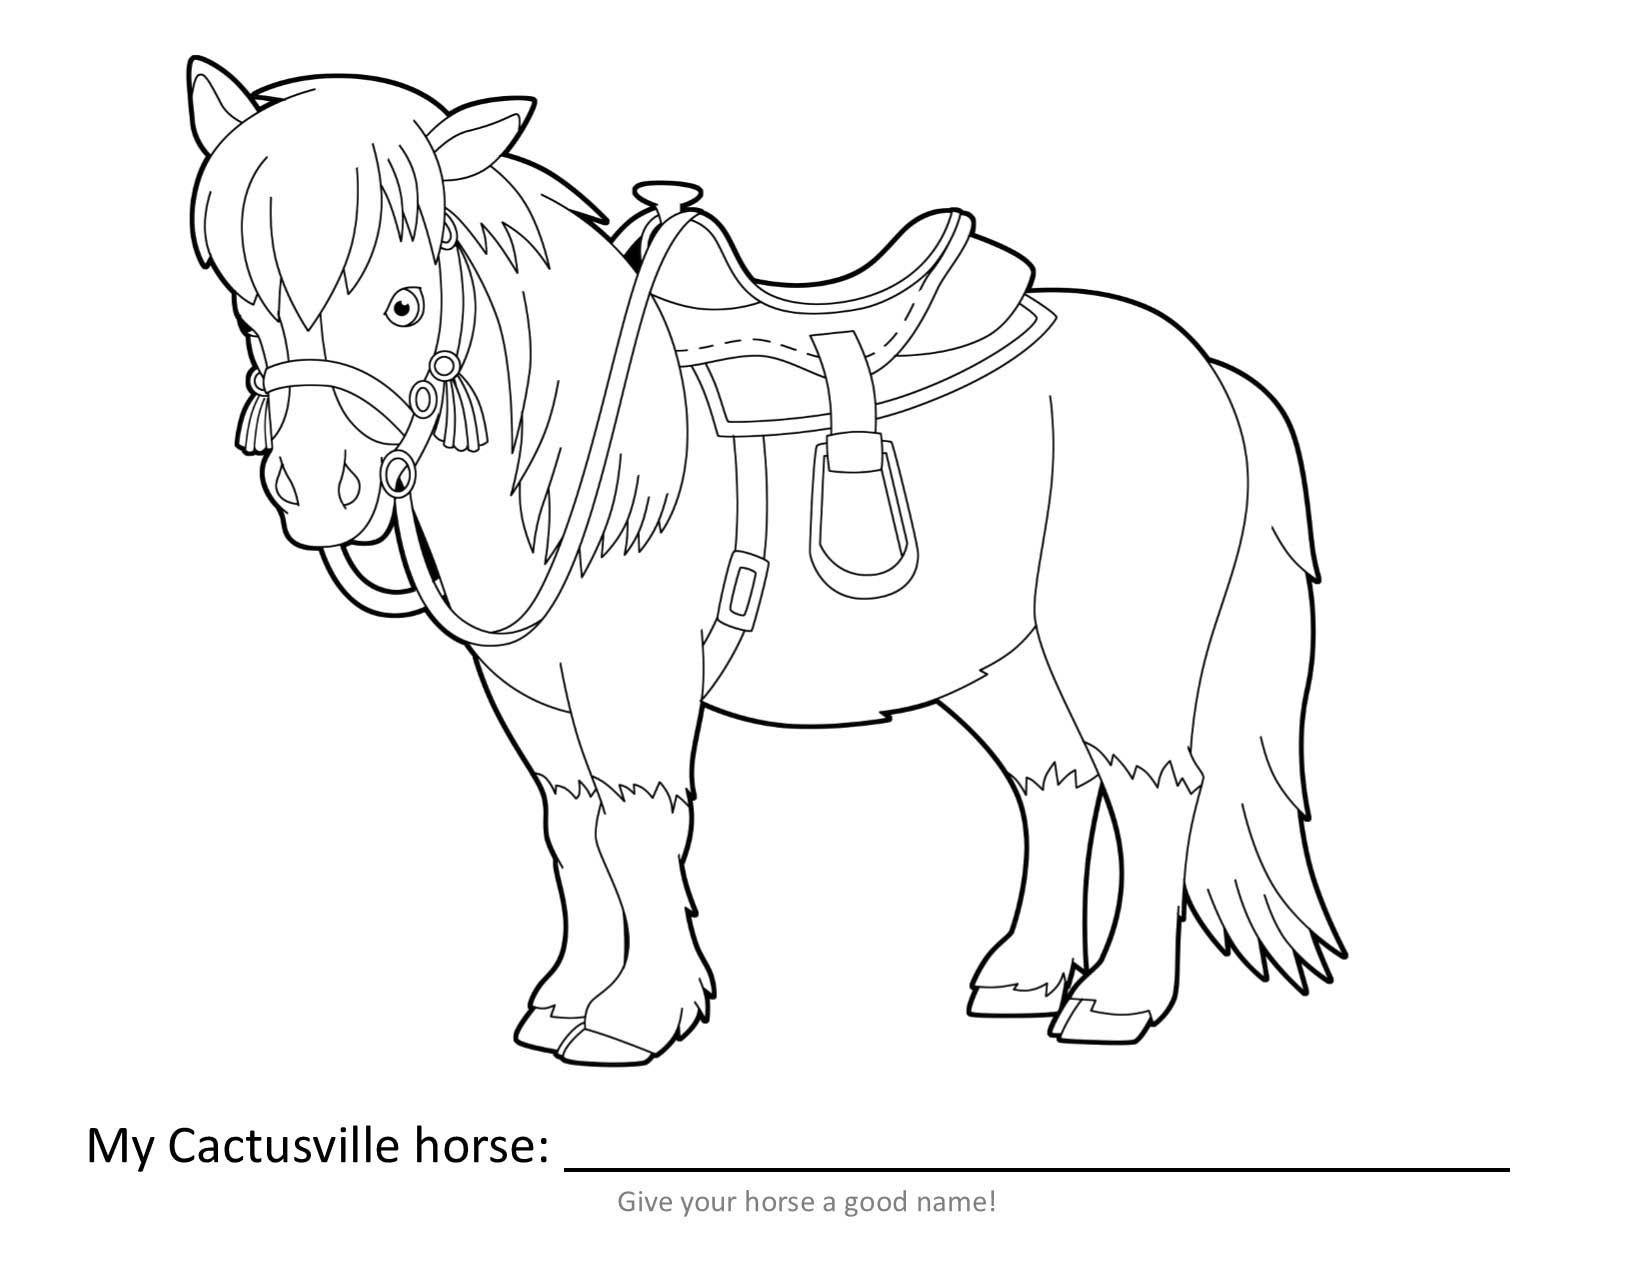 Horse Coloring Page | VBX 2017: Cactusville | Pinterest | Horse